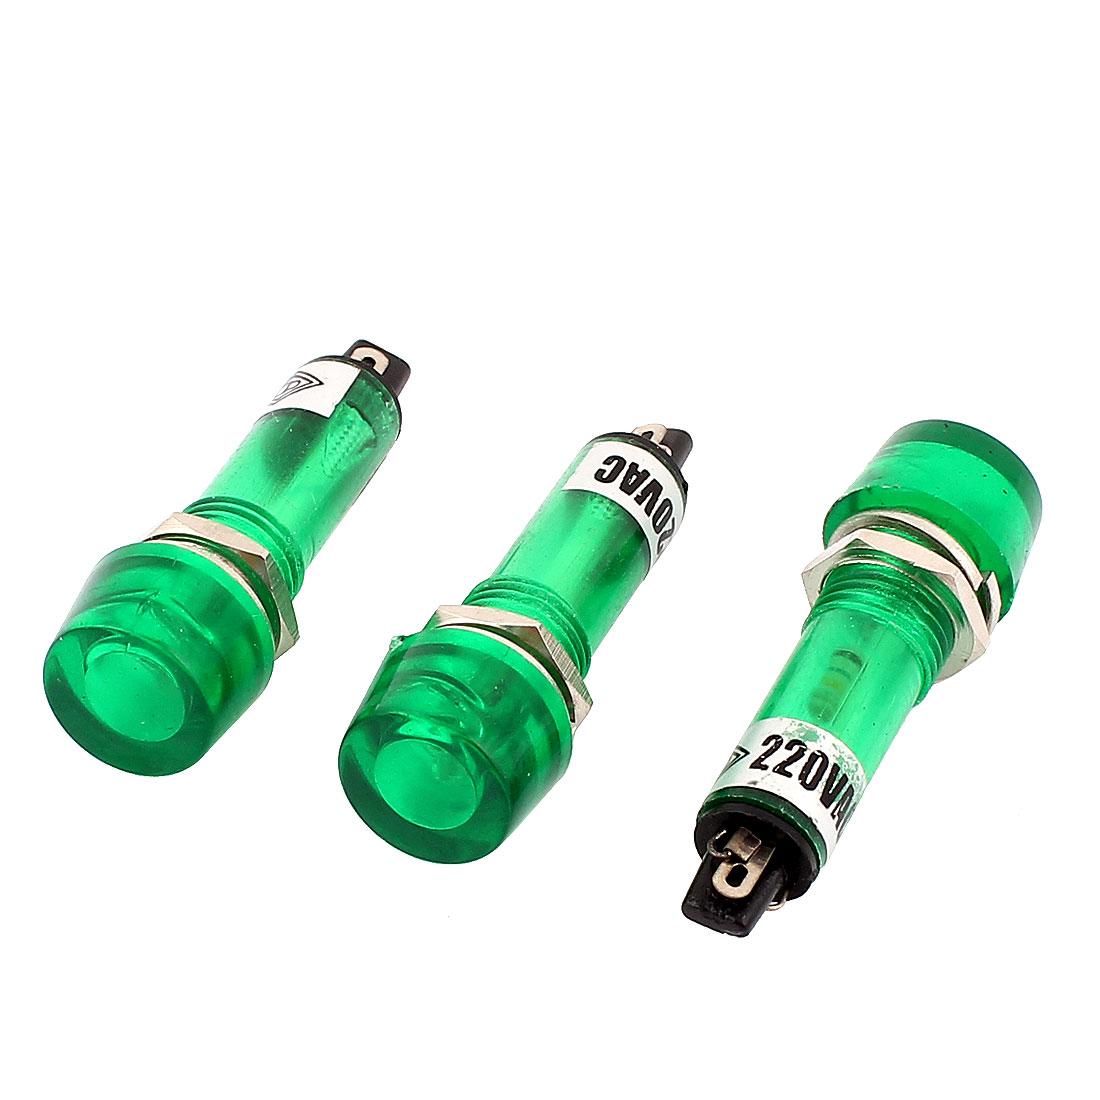 3 Pcs AC 220V Green Round Cap 2 Terminal Signal Lamp Indicator Lights